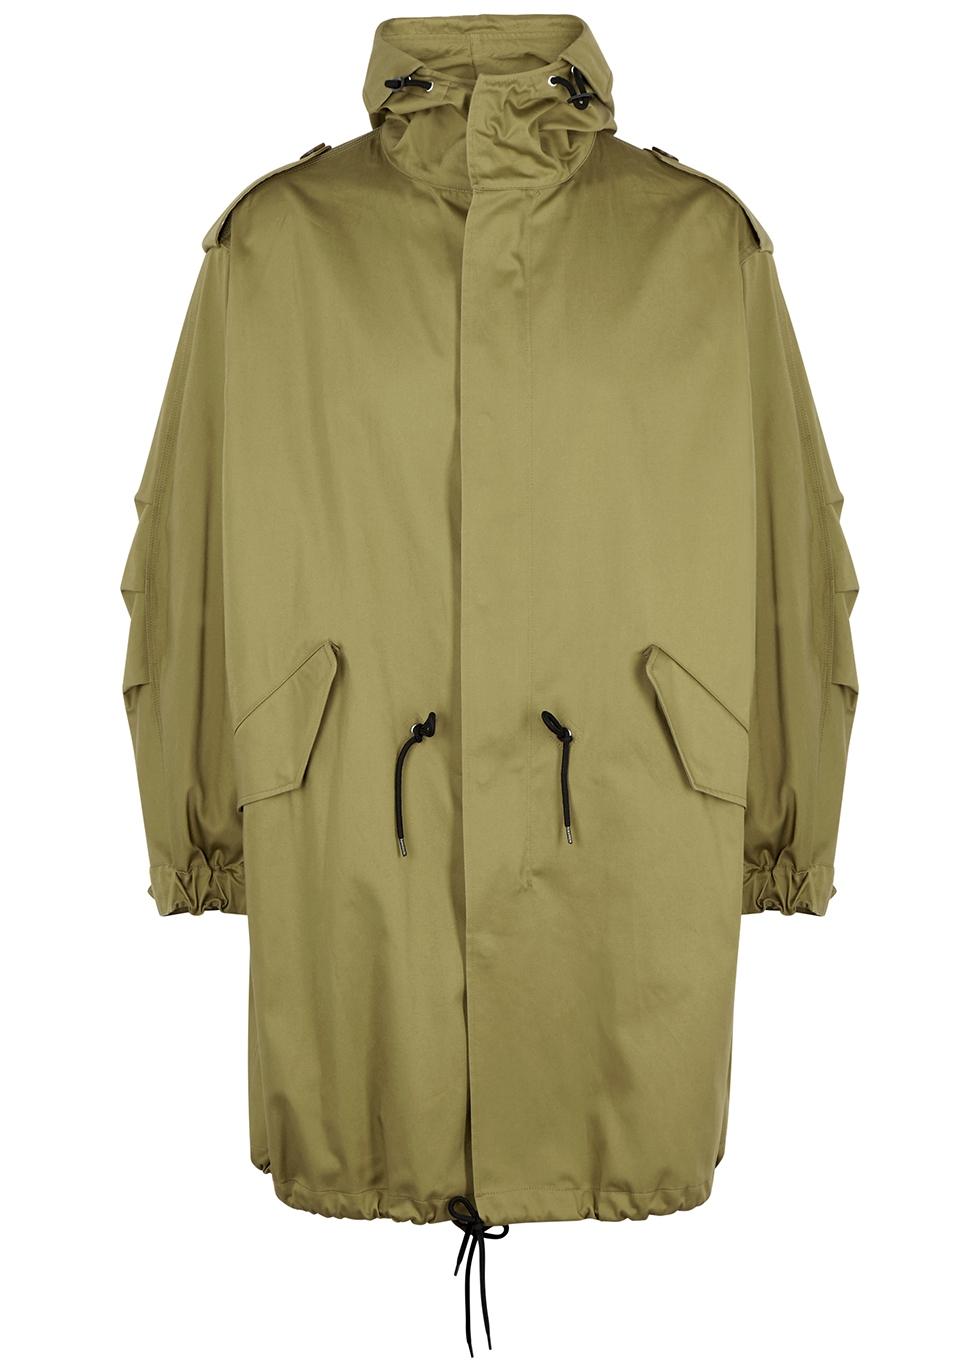 Harvey nichols - Givenchy Parka -40% off - £1191 + free Click and Collect @ Harvey Nichols